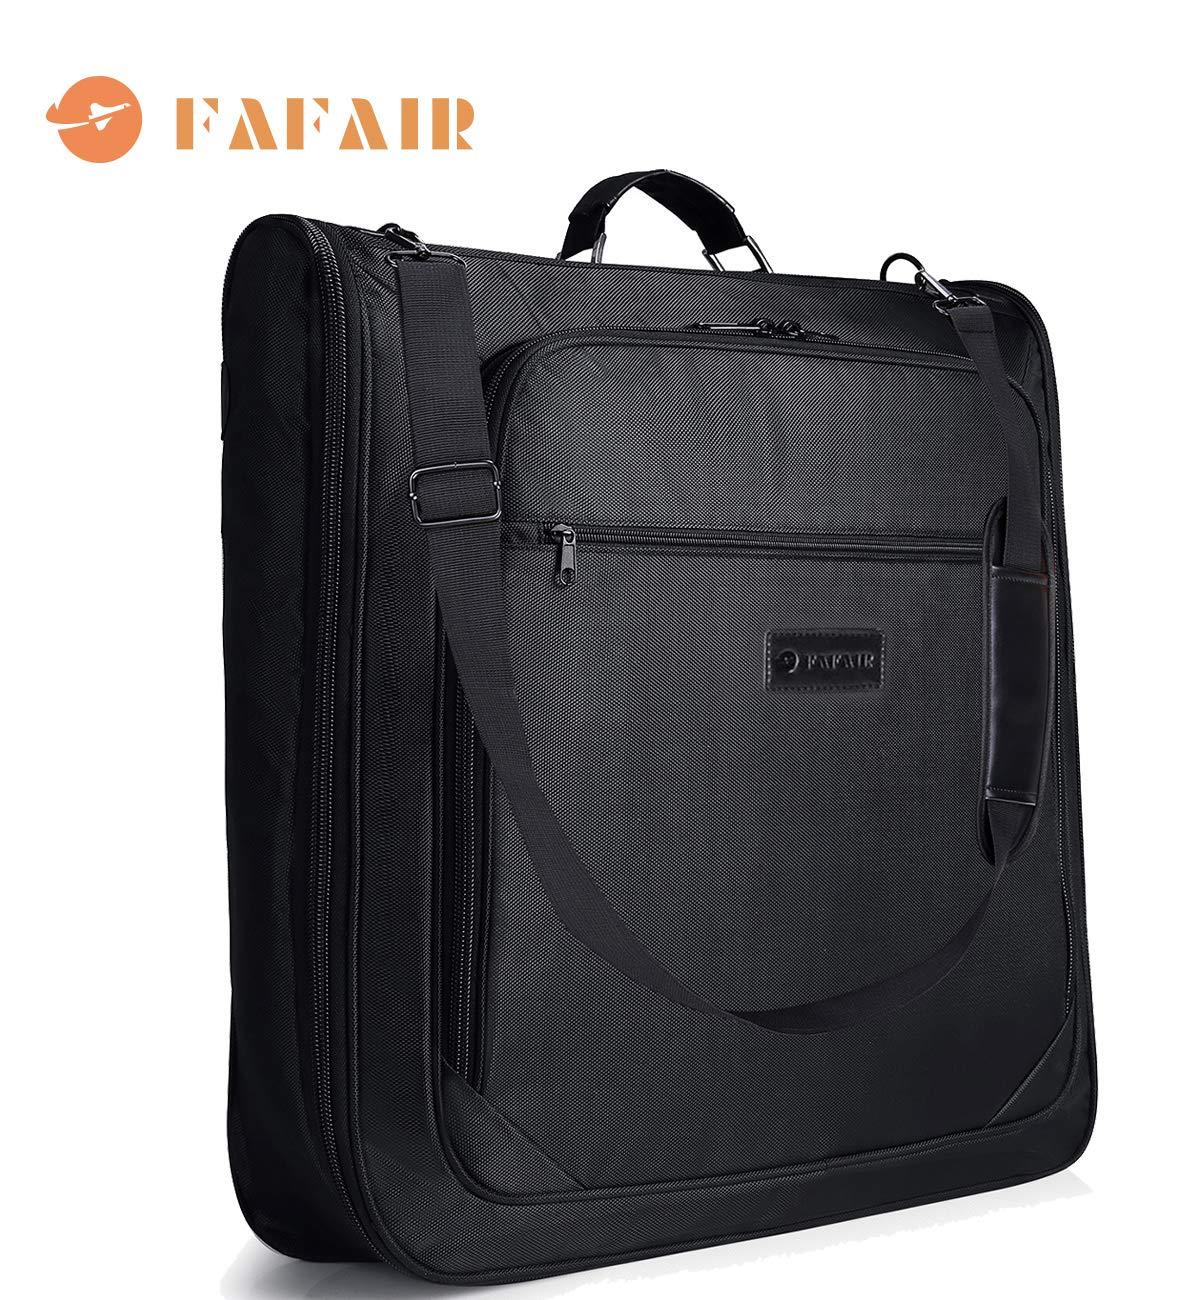 Carry On Garment Bag, Hanging Suit Bag/Carrier Weekend Bag Travel Business Trip